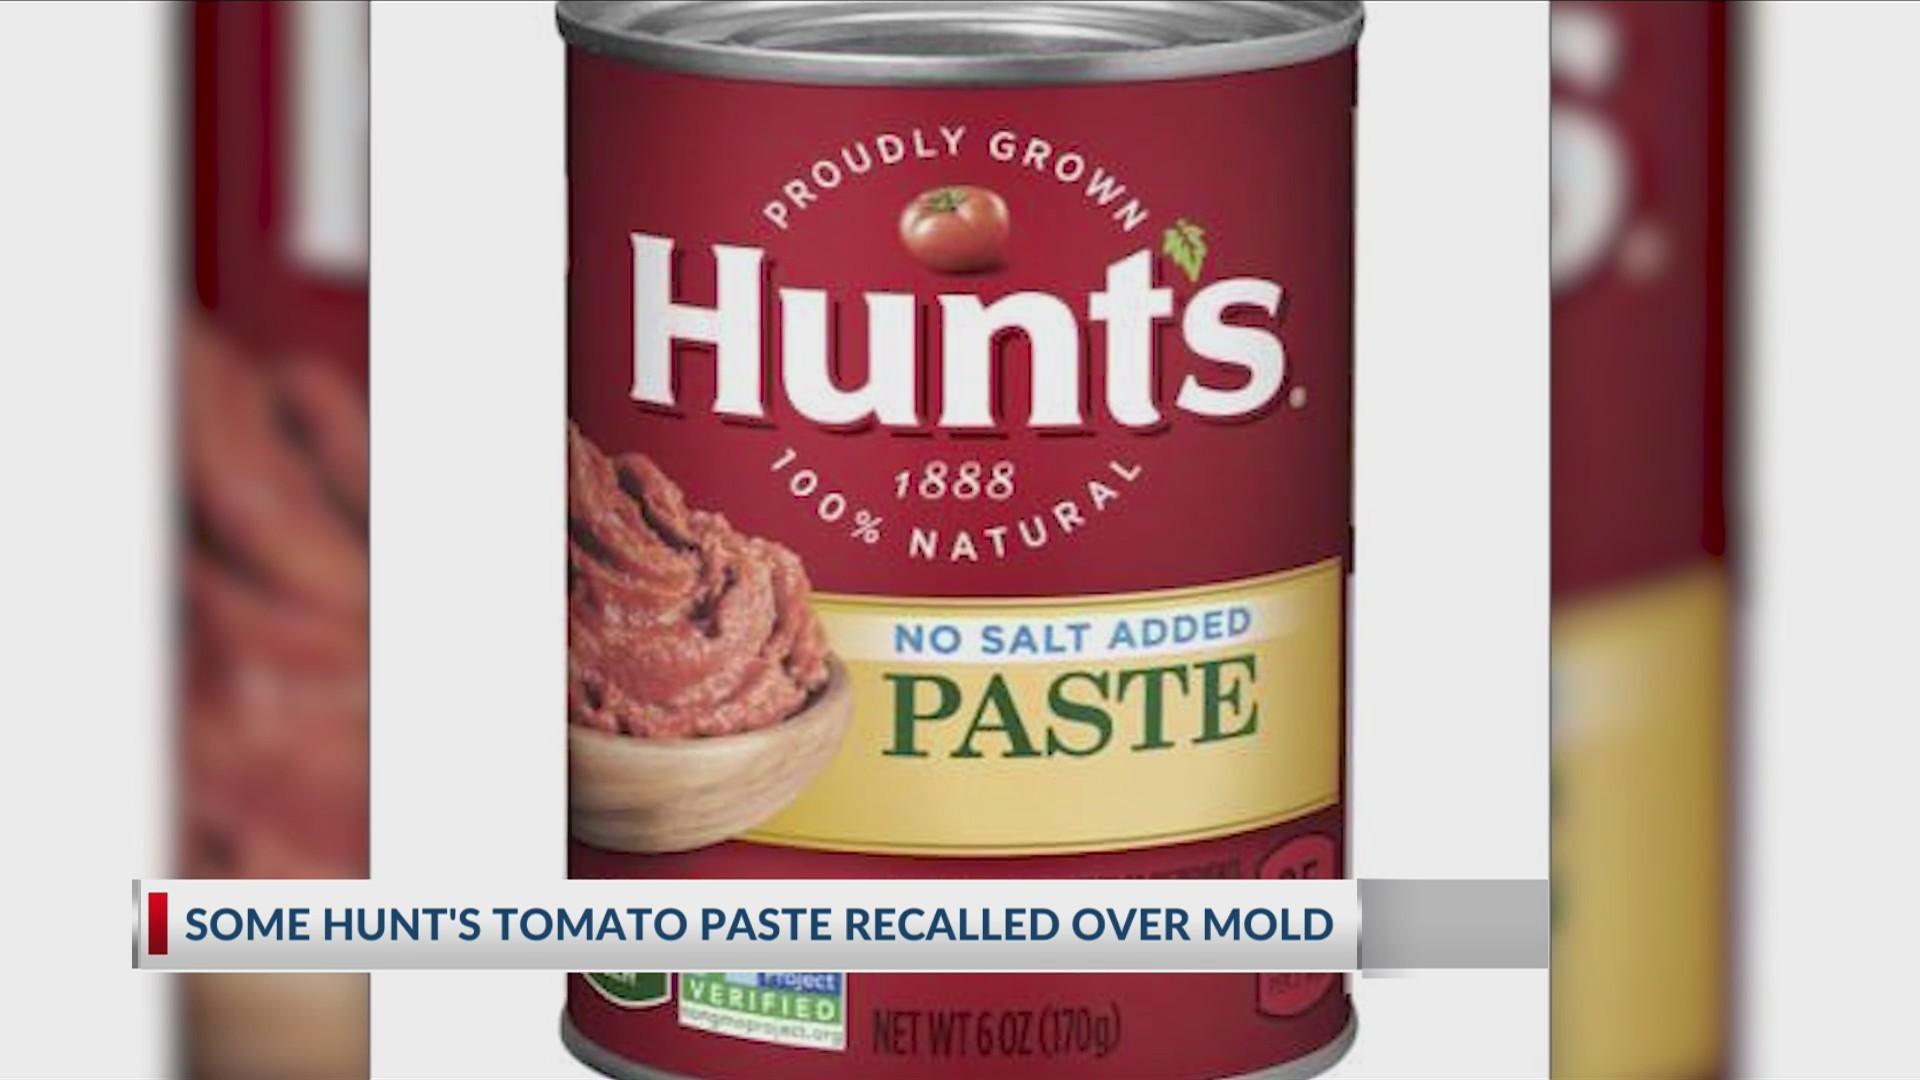 Hunts recall